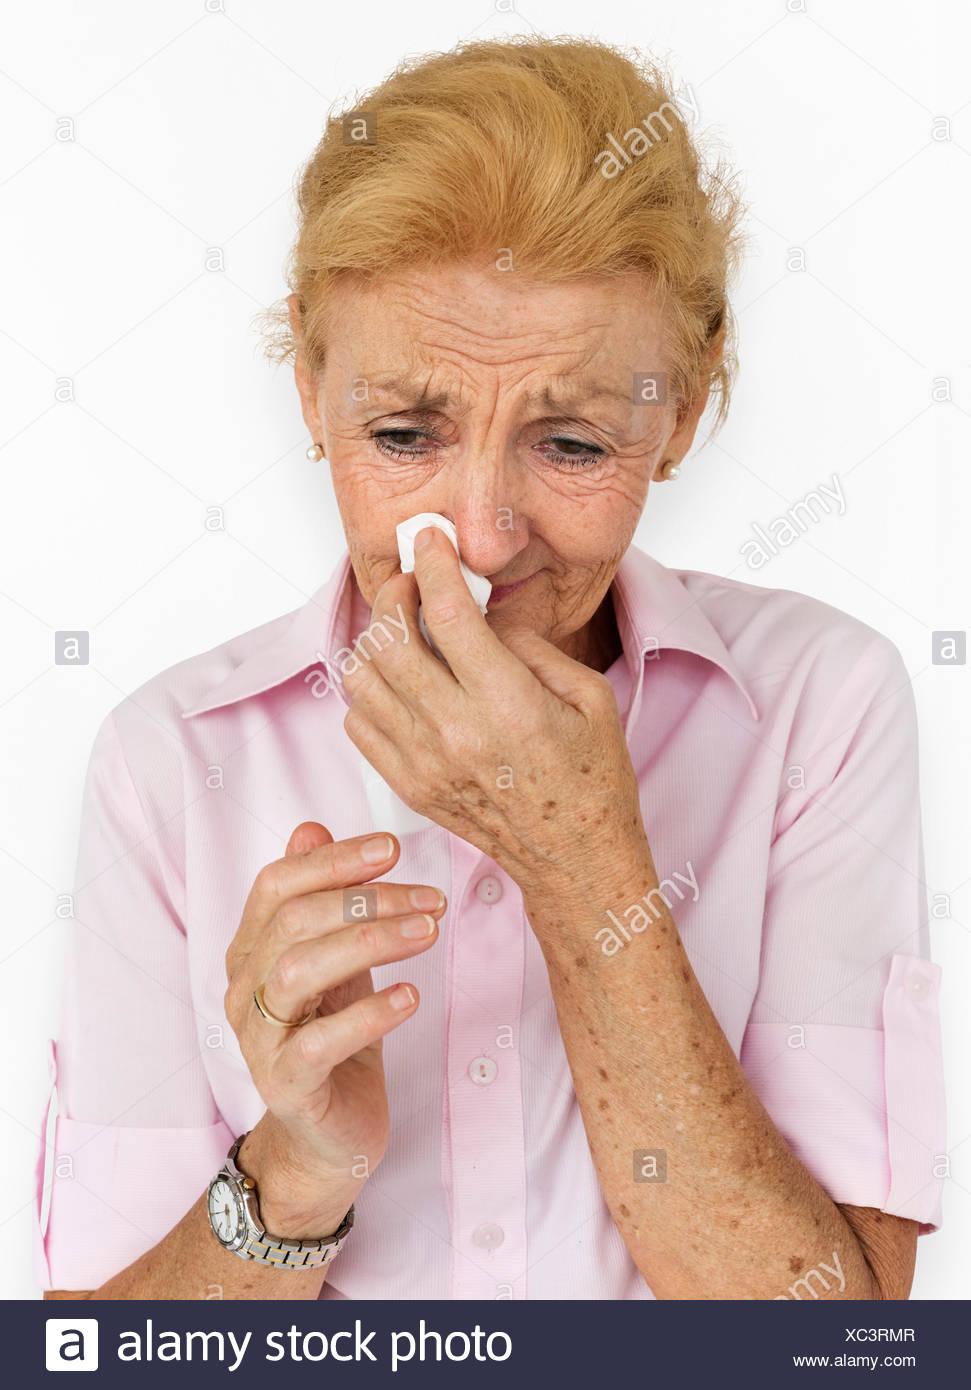 Upset Crying Depression Senior Woman Concept - Stock Image